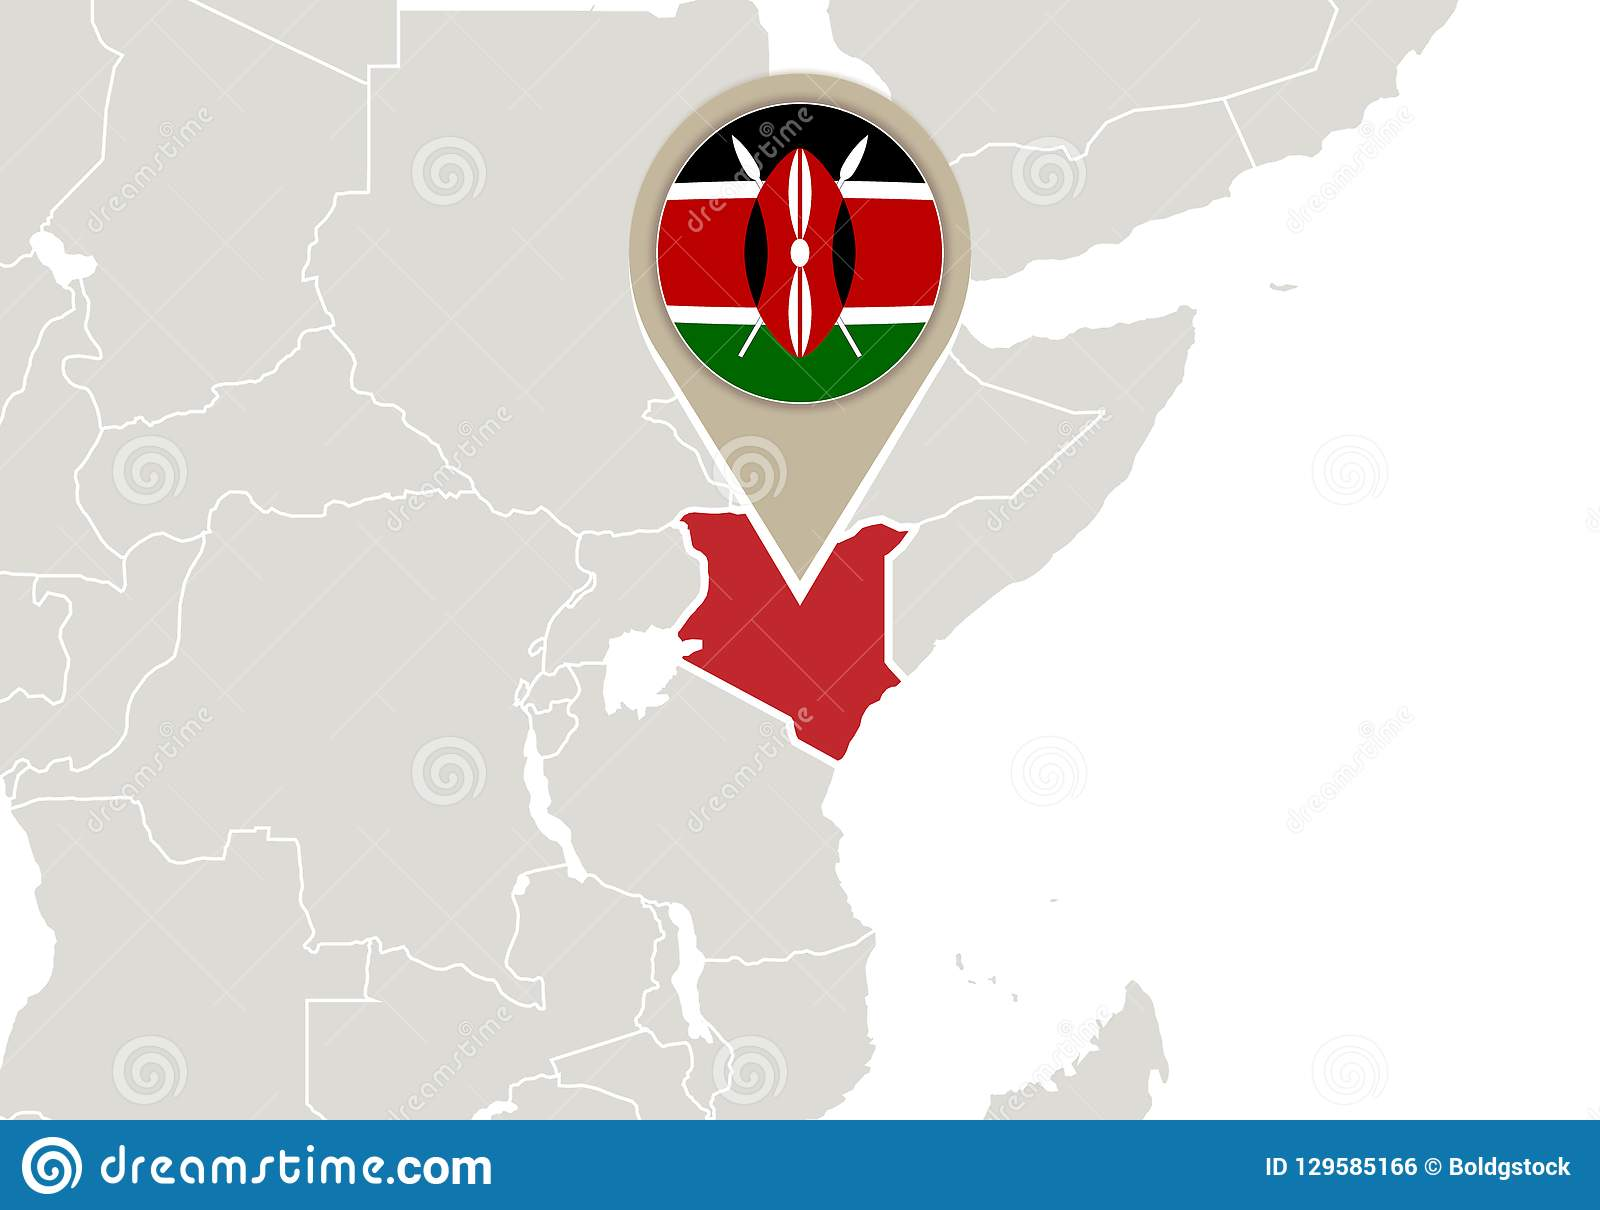 Kenya On World Map Stock Vector Illustration Of Kenya 129585166